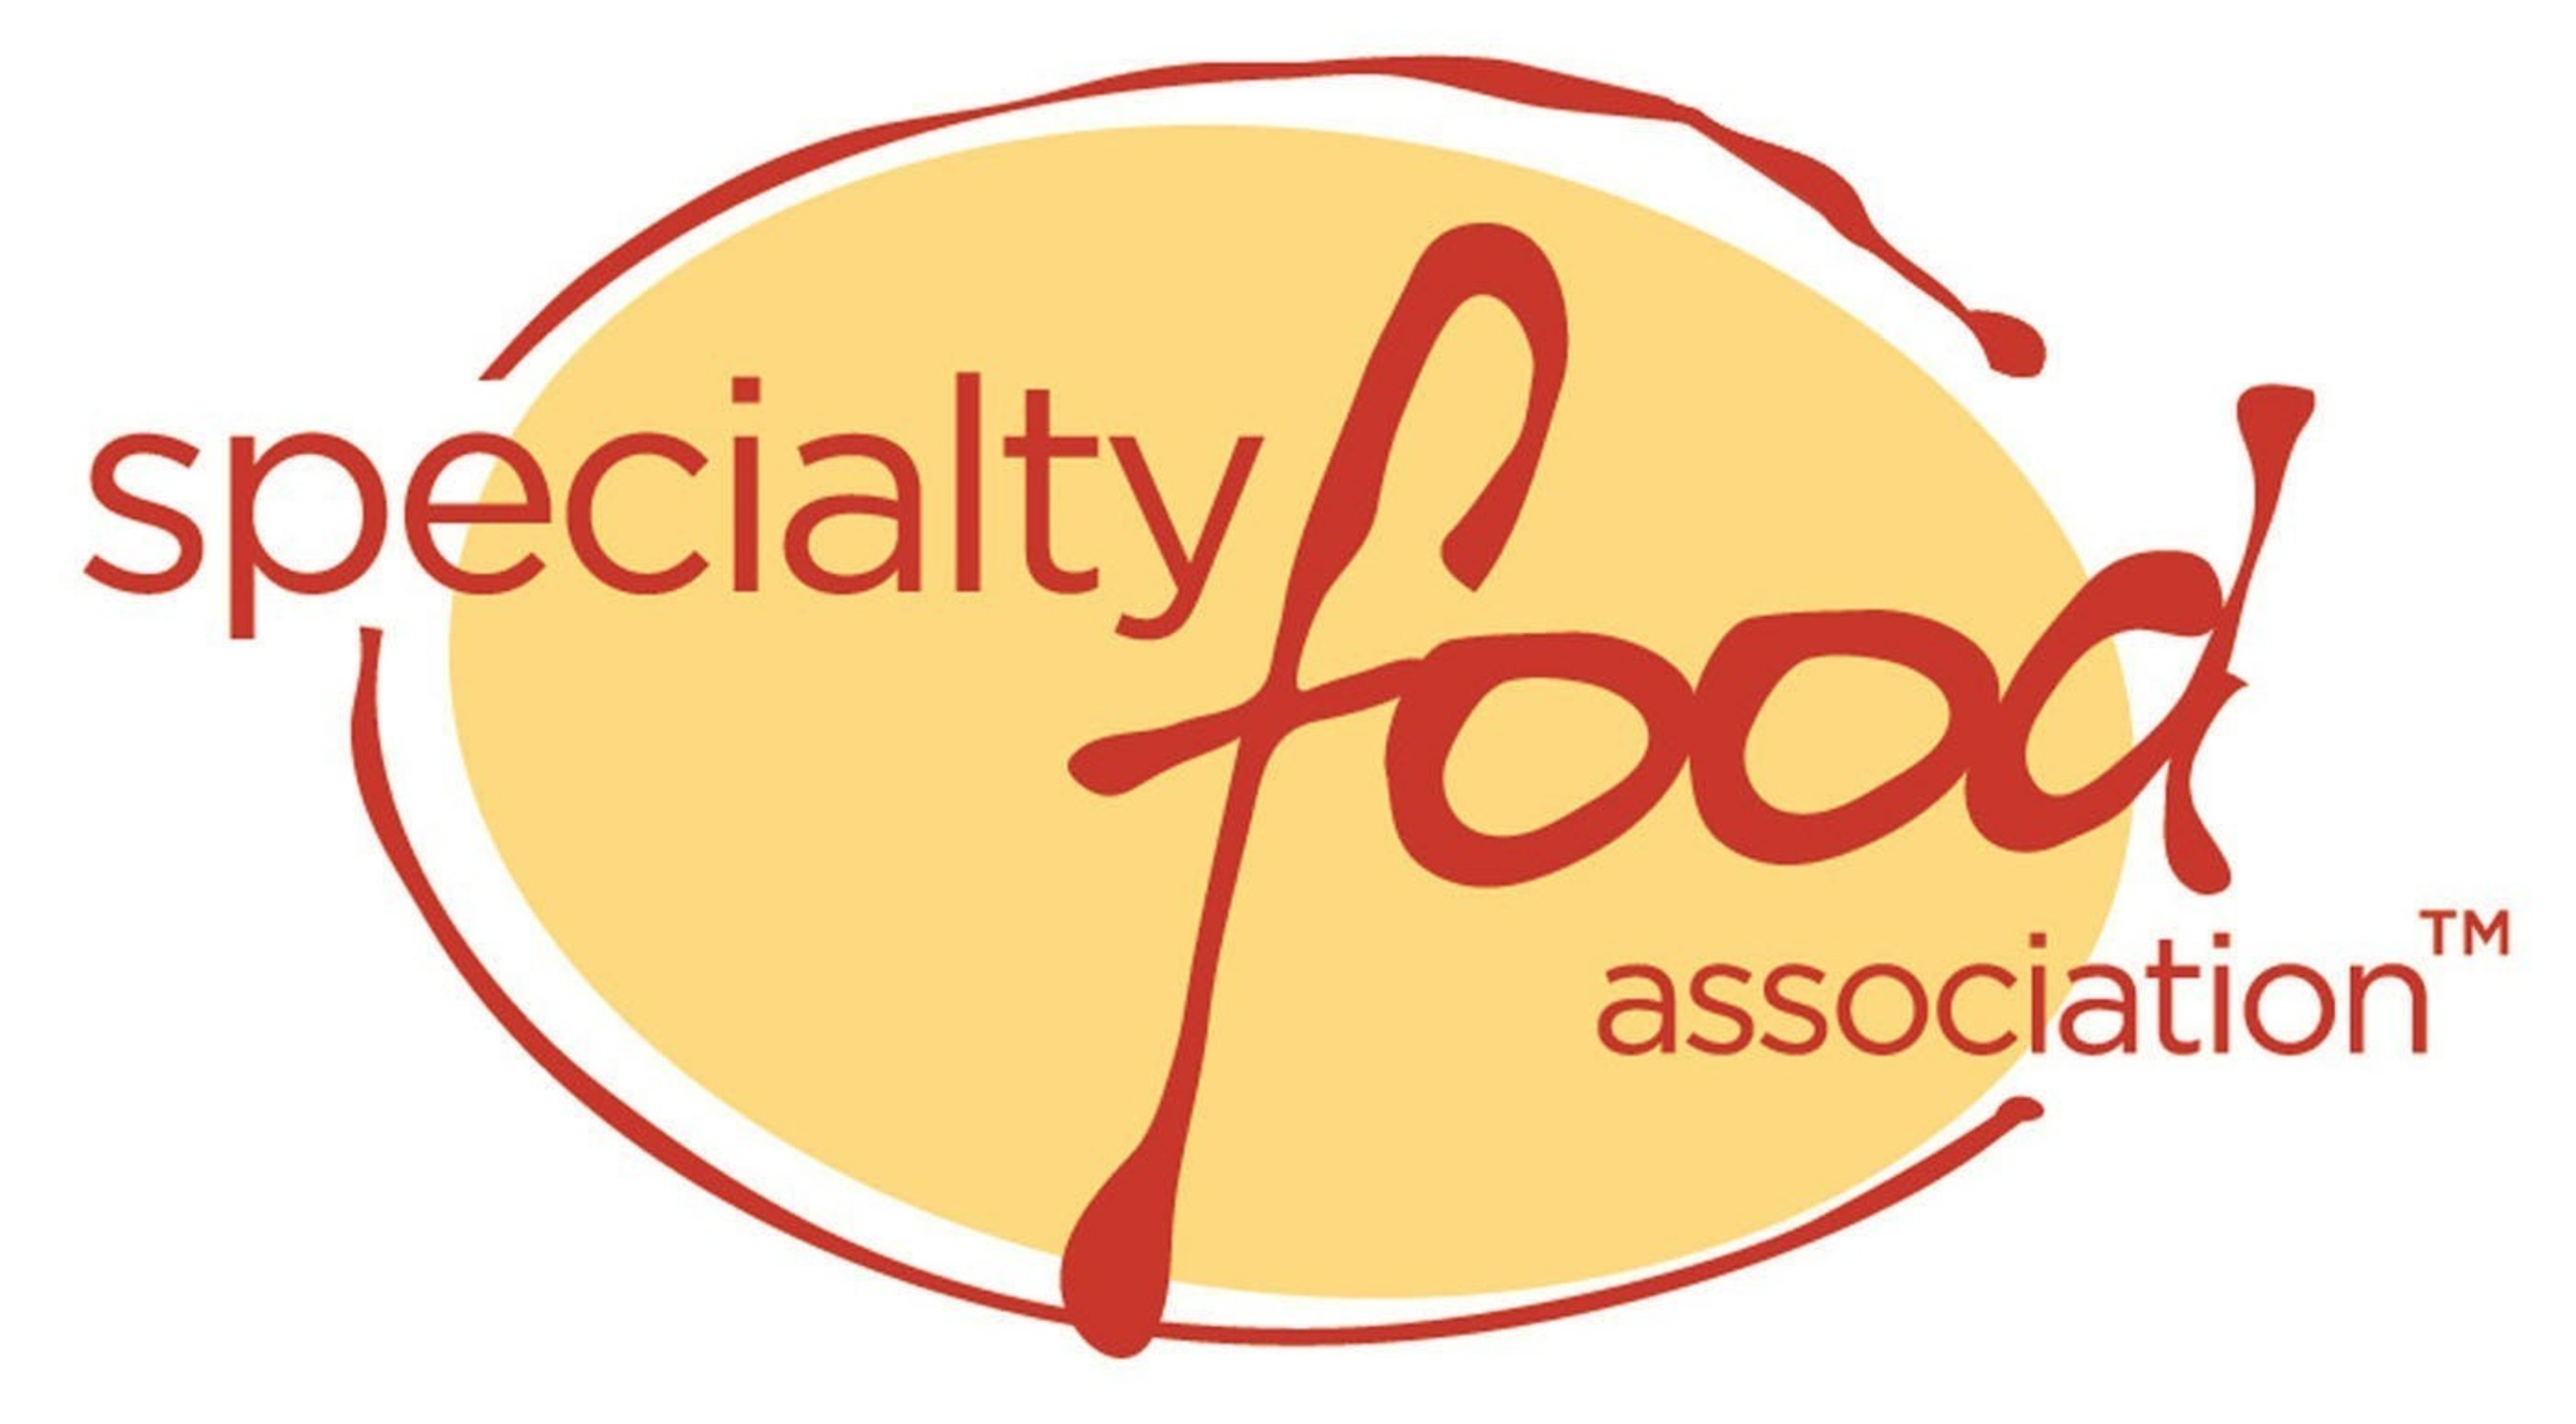 Specialty Food Association logo.